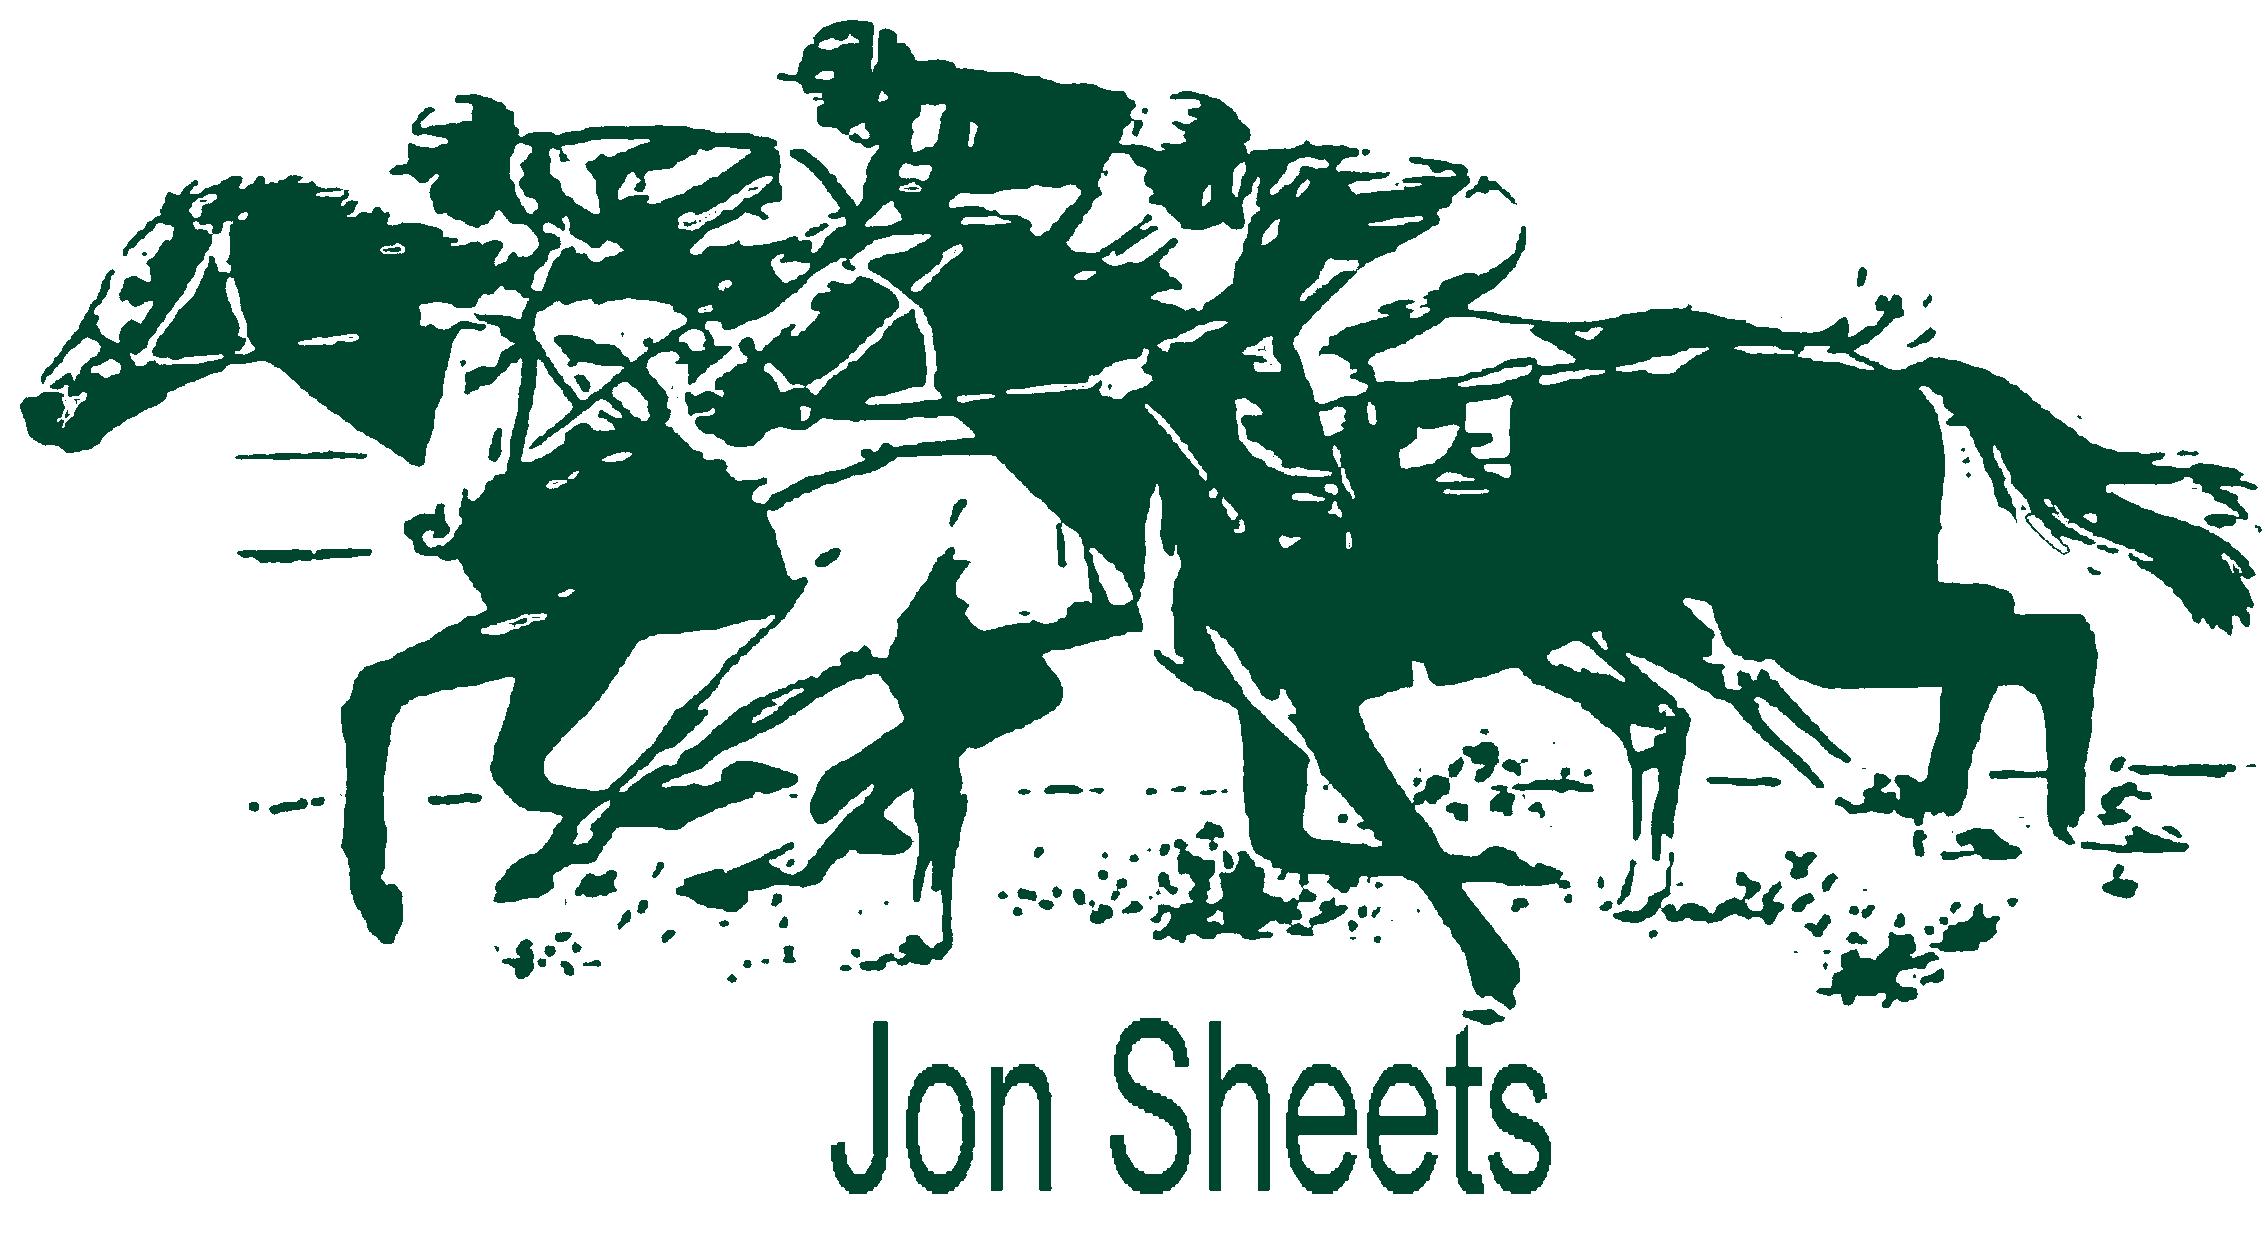 Jon Sheets